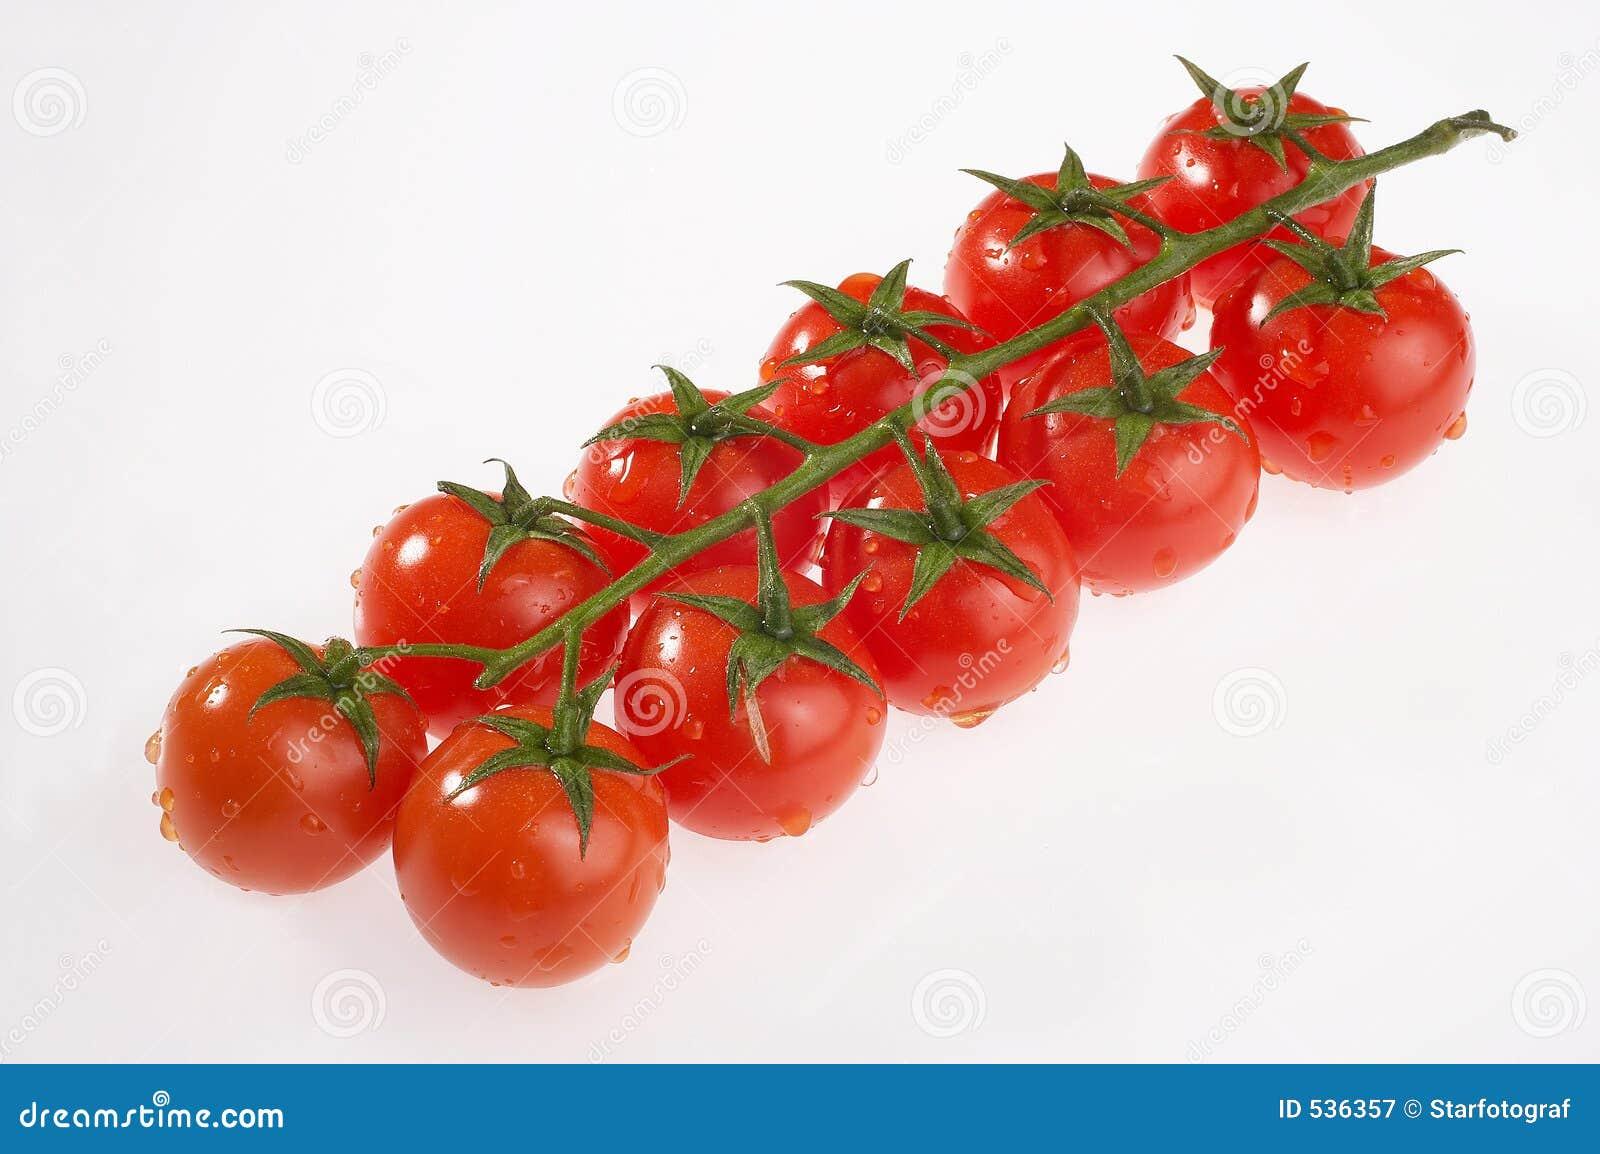 Download Risp rispentomaten蕃茄 库存图片. 图片 包括有 埃森, 烹调, 卫生, 素食者, 蕃茄, 问题的 - 536357